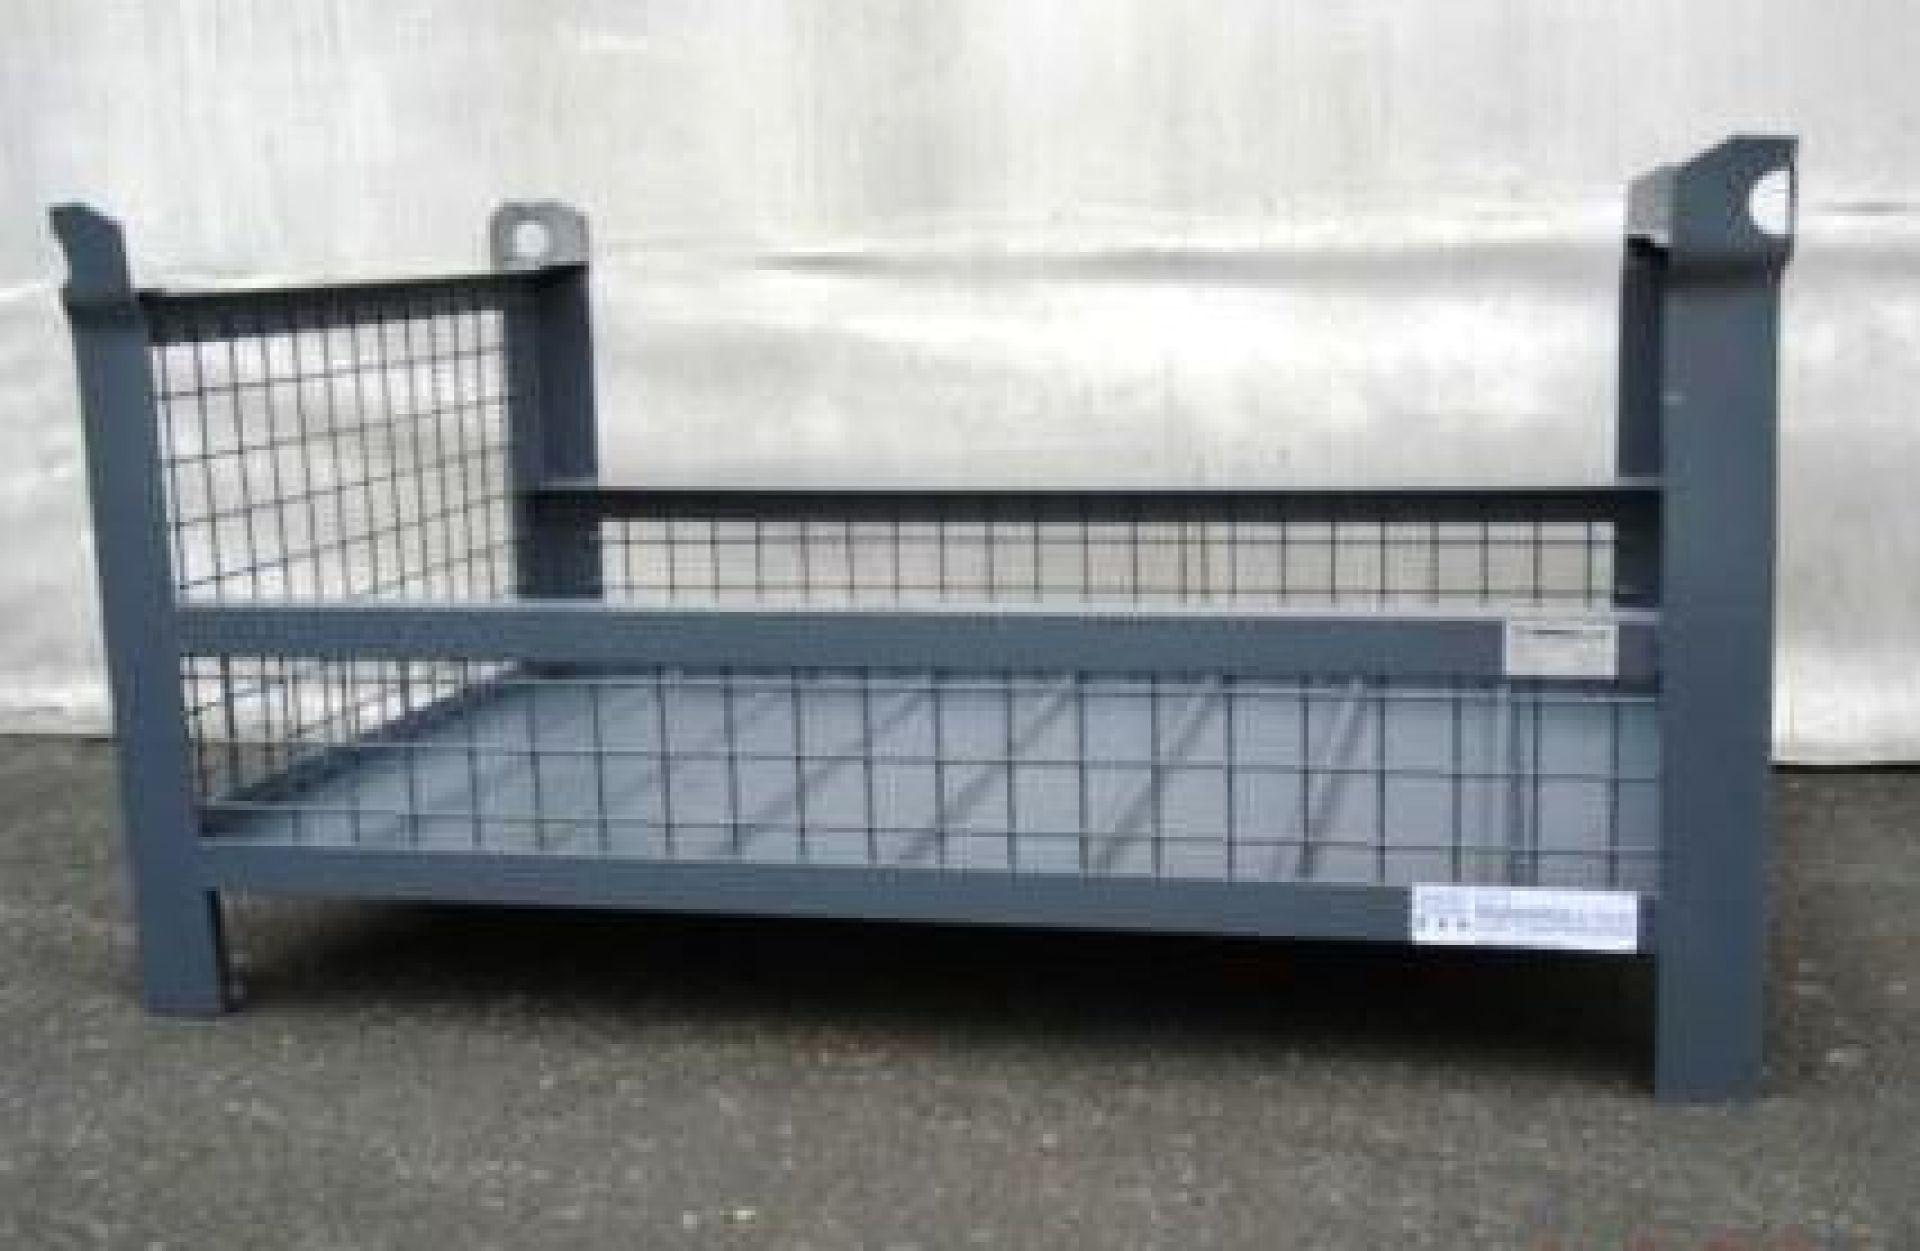 Gitterbehälter kranbar mit zwei offenen Langseiten